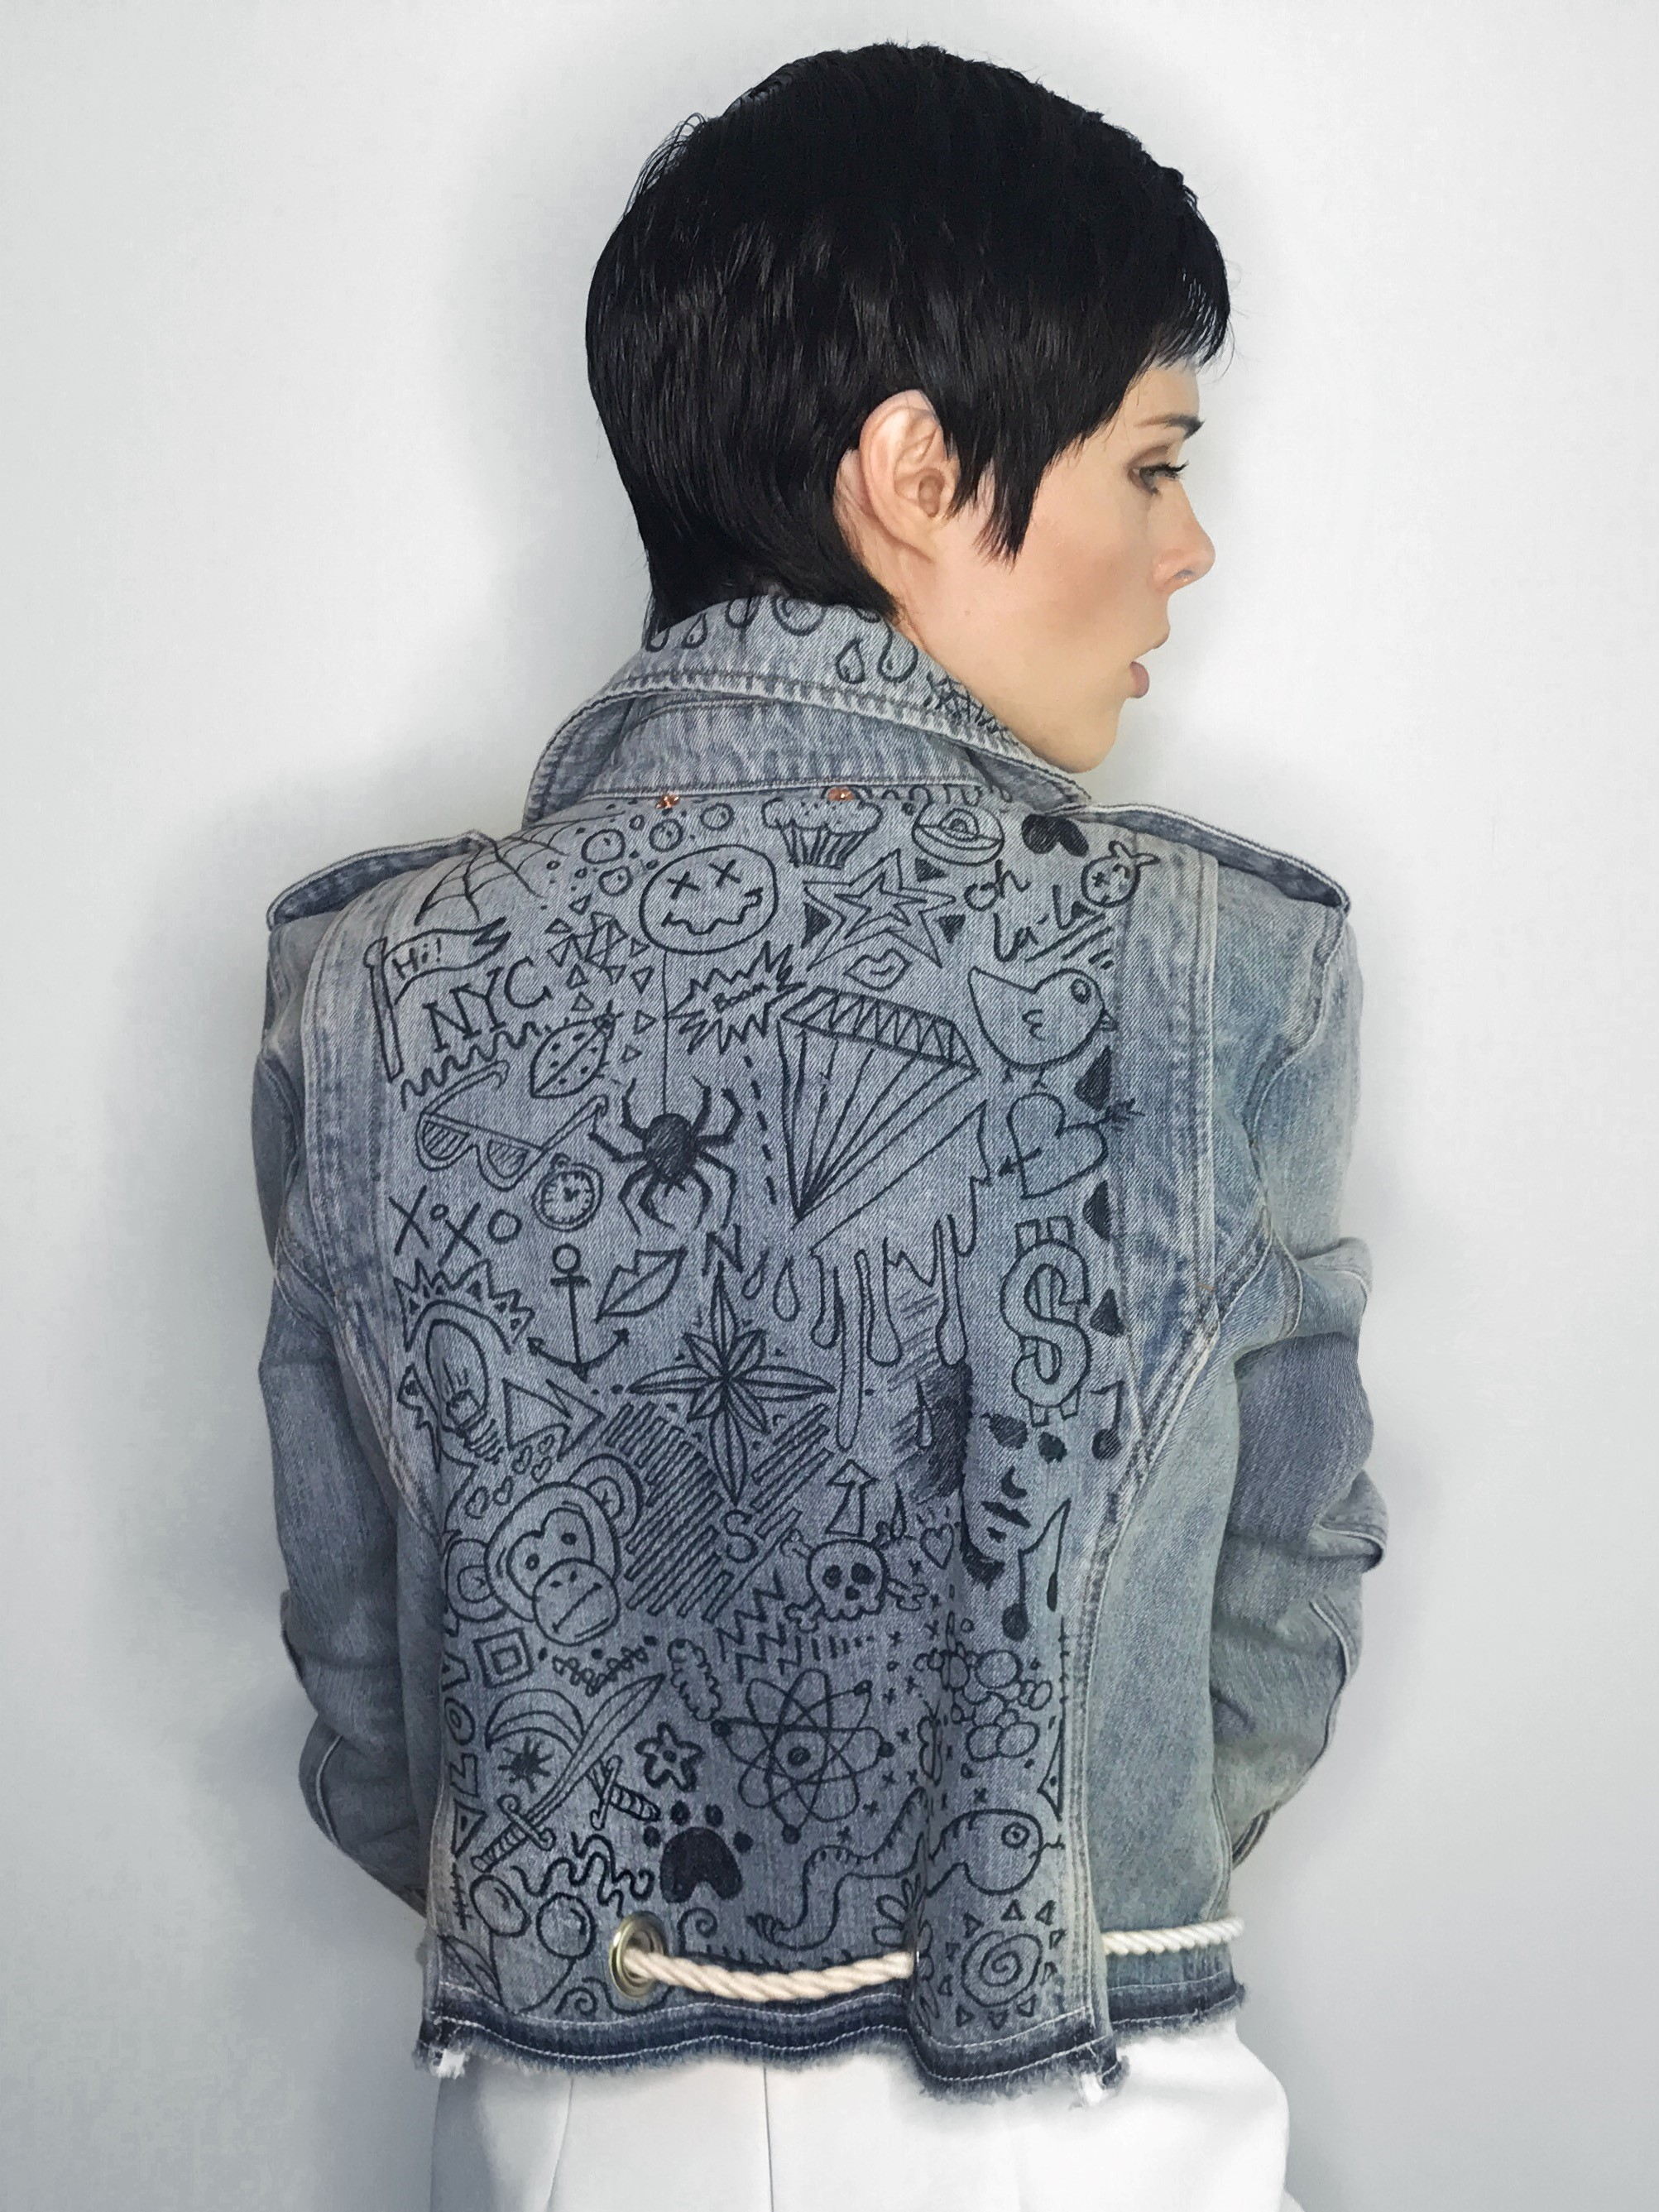 Coco Rocha's customised denim jacket